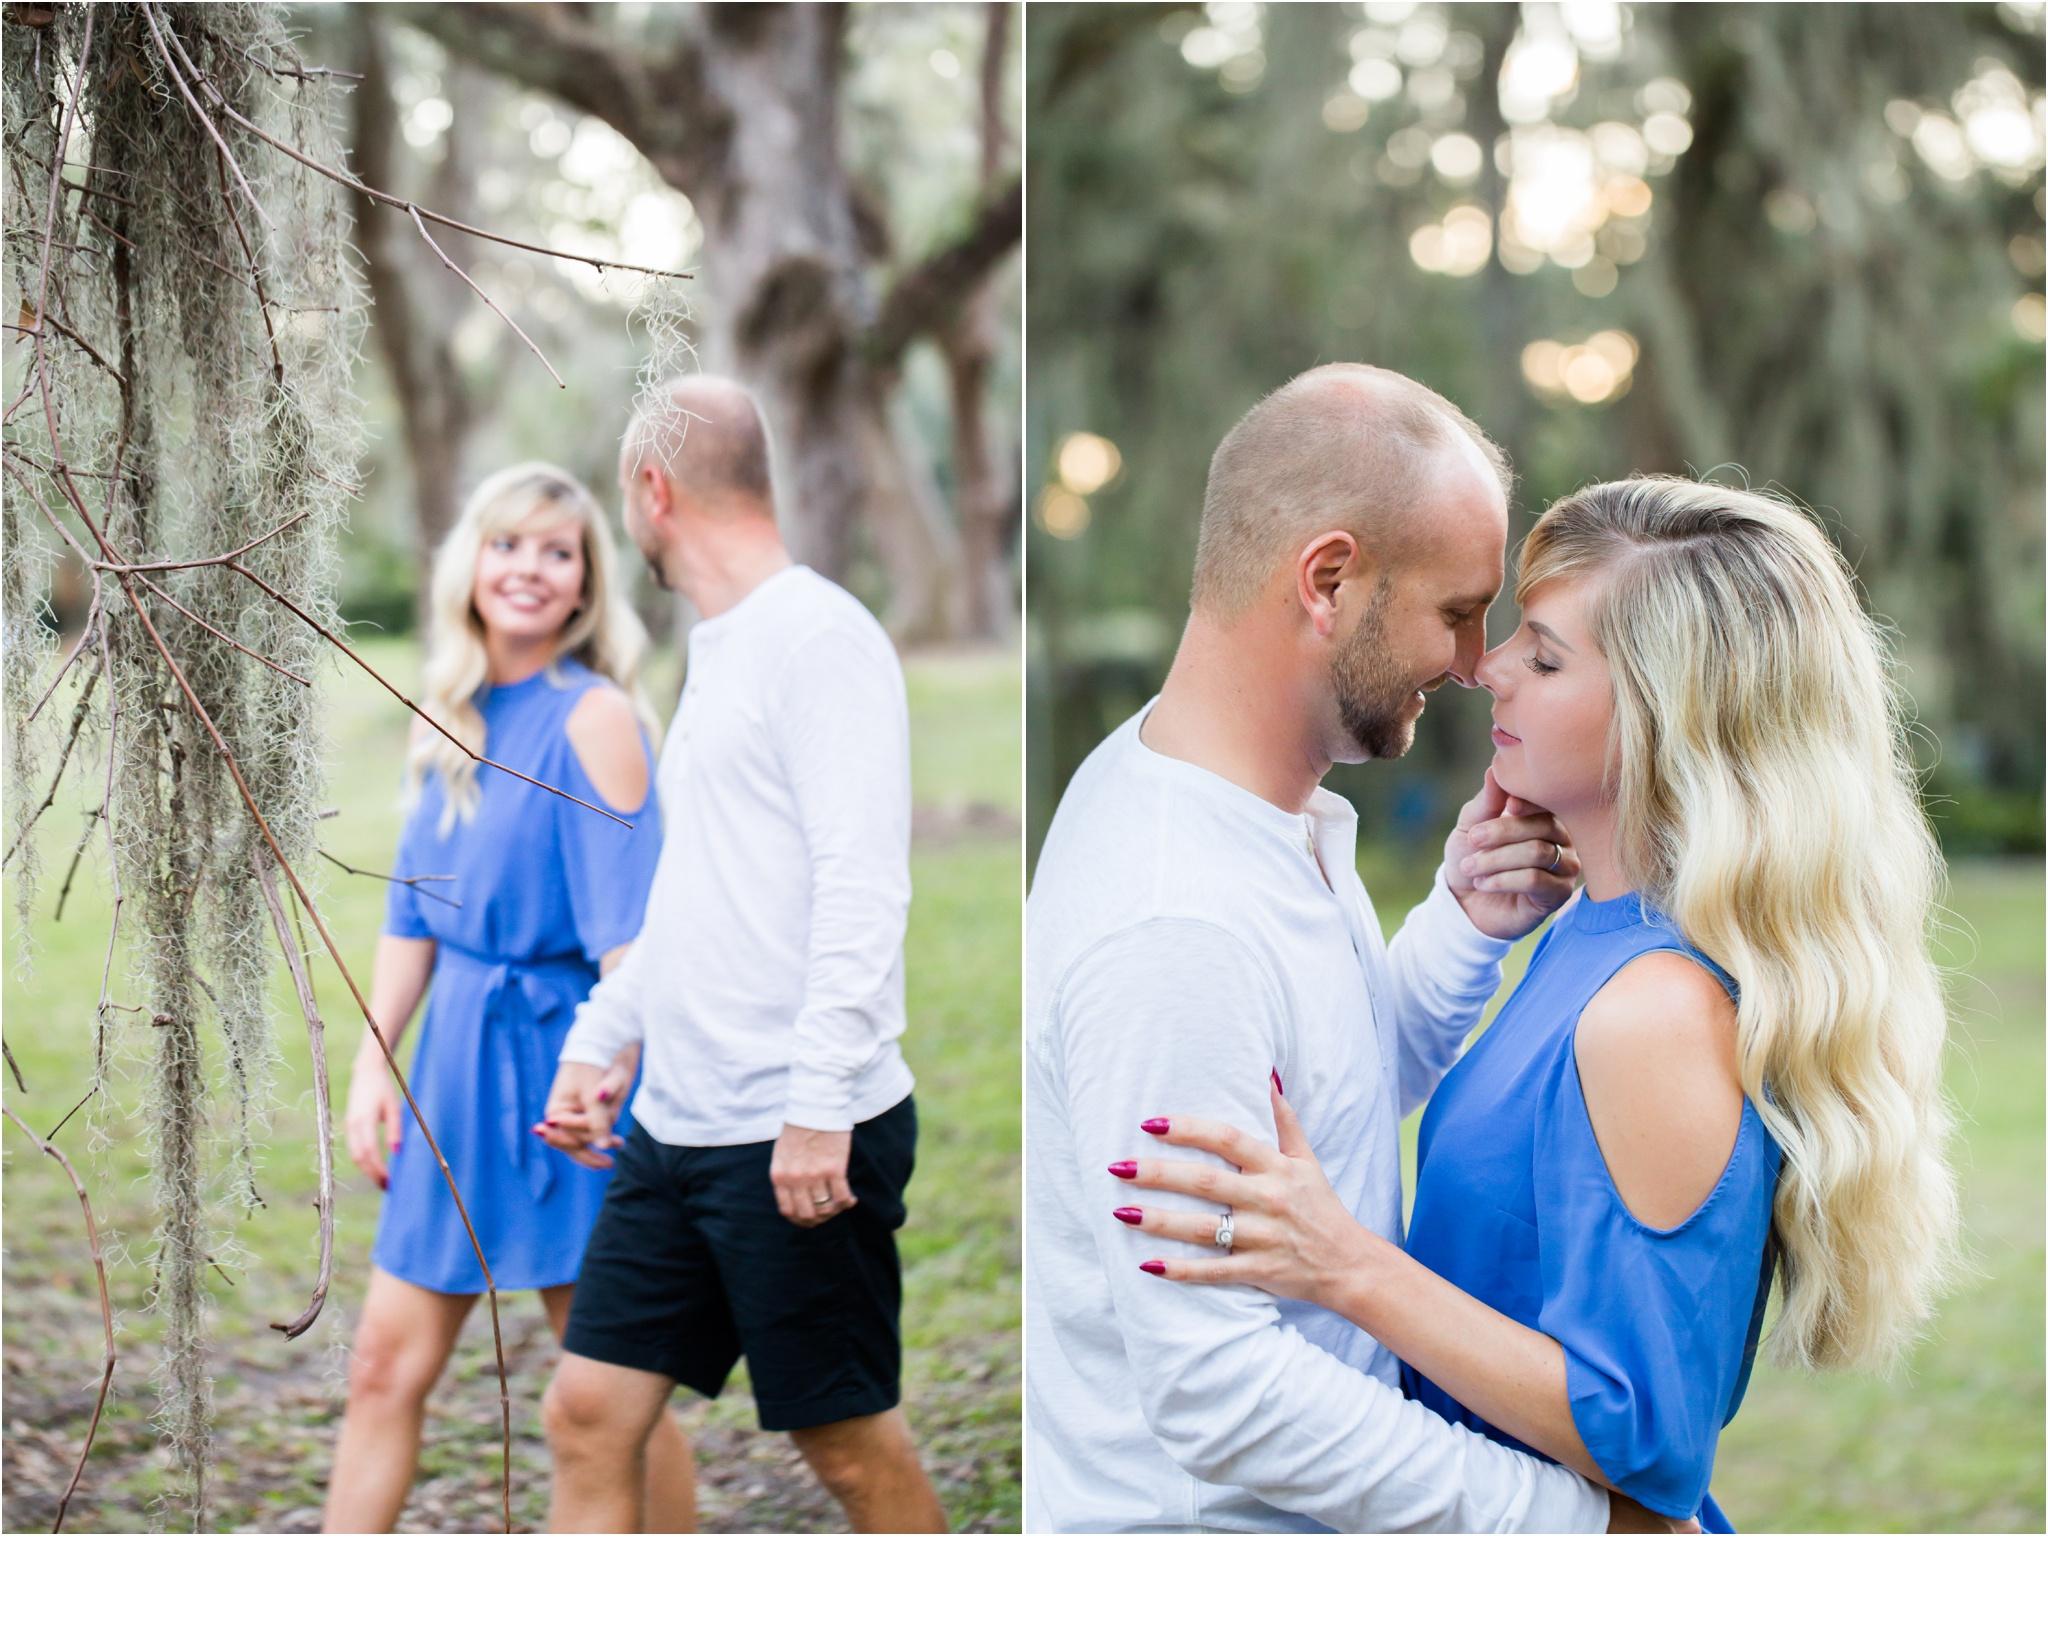 Rainey_Gregg_Photography_St._Simons_Island_Georgia_California_Wedding_Portrait_Photography_0265.jpg